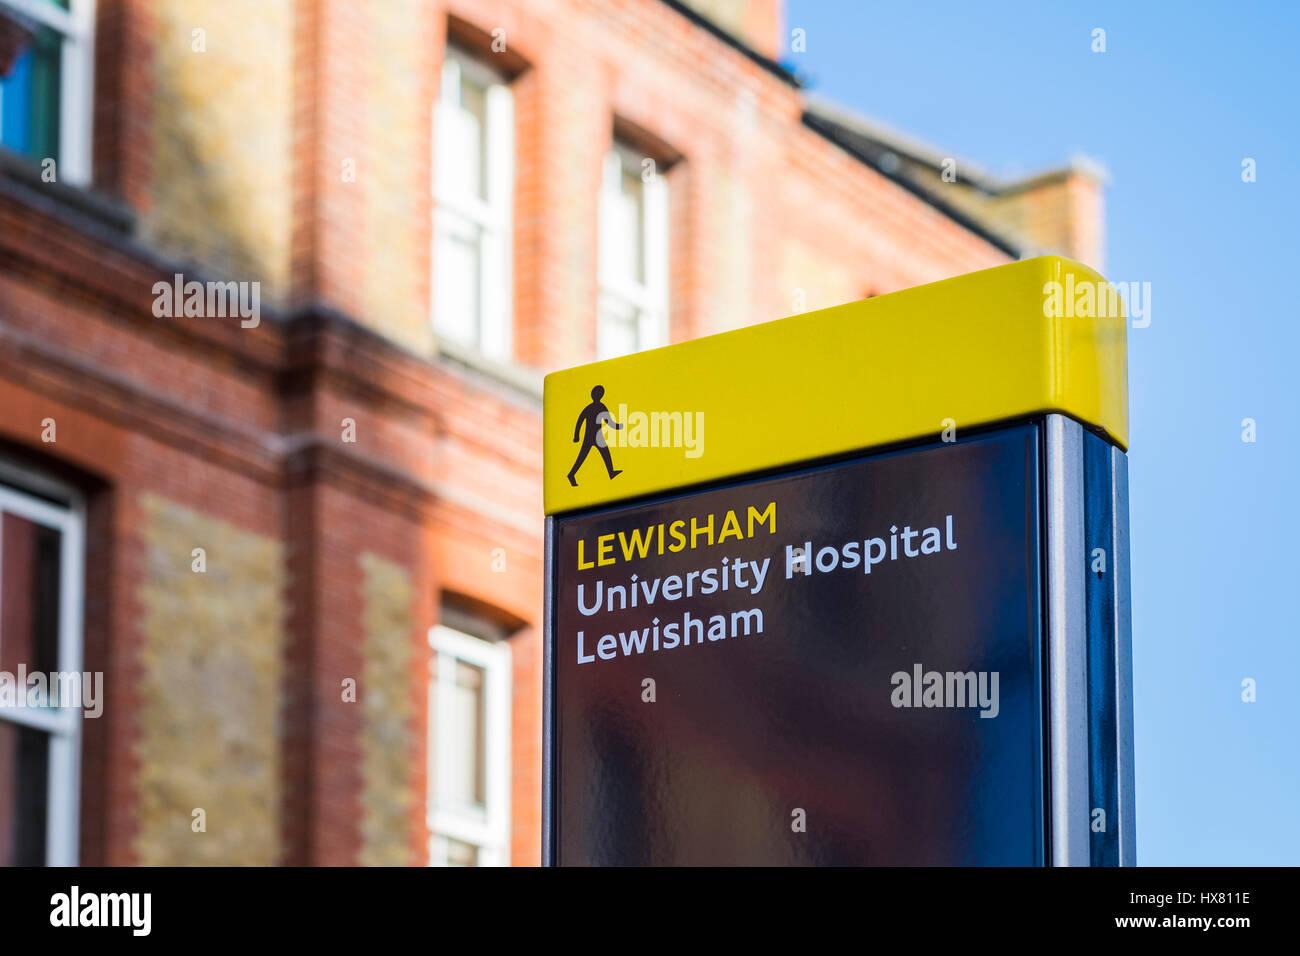 university hospital lewisham south london stock photos. Black Bedroom Furniture Sets. Home Design Ideas